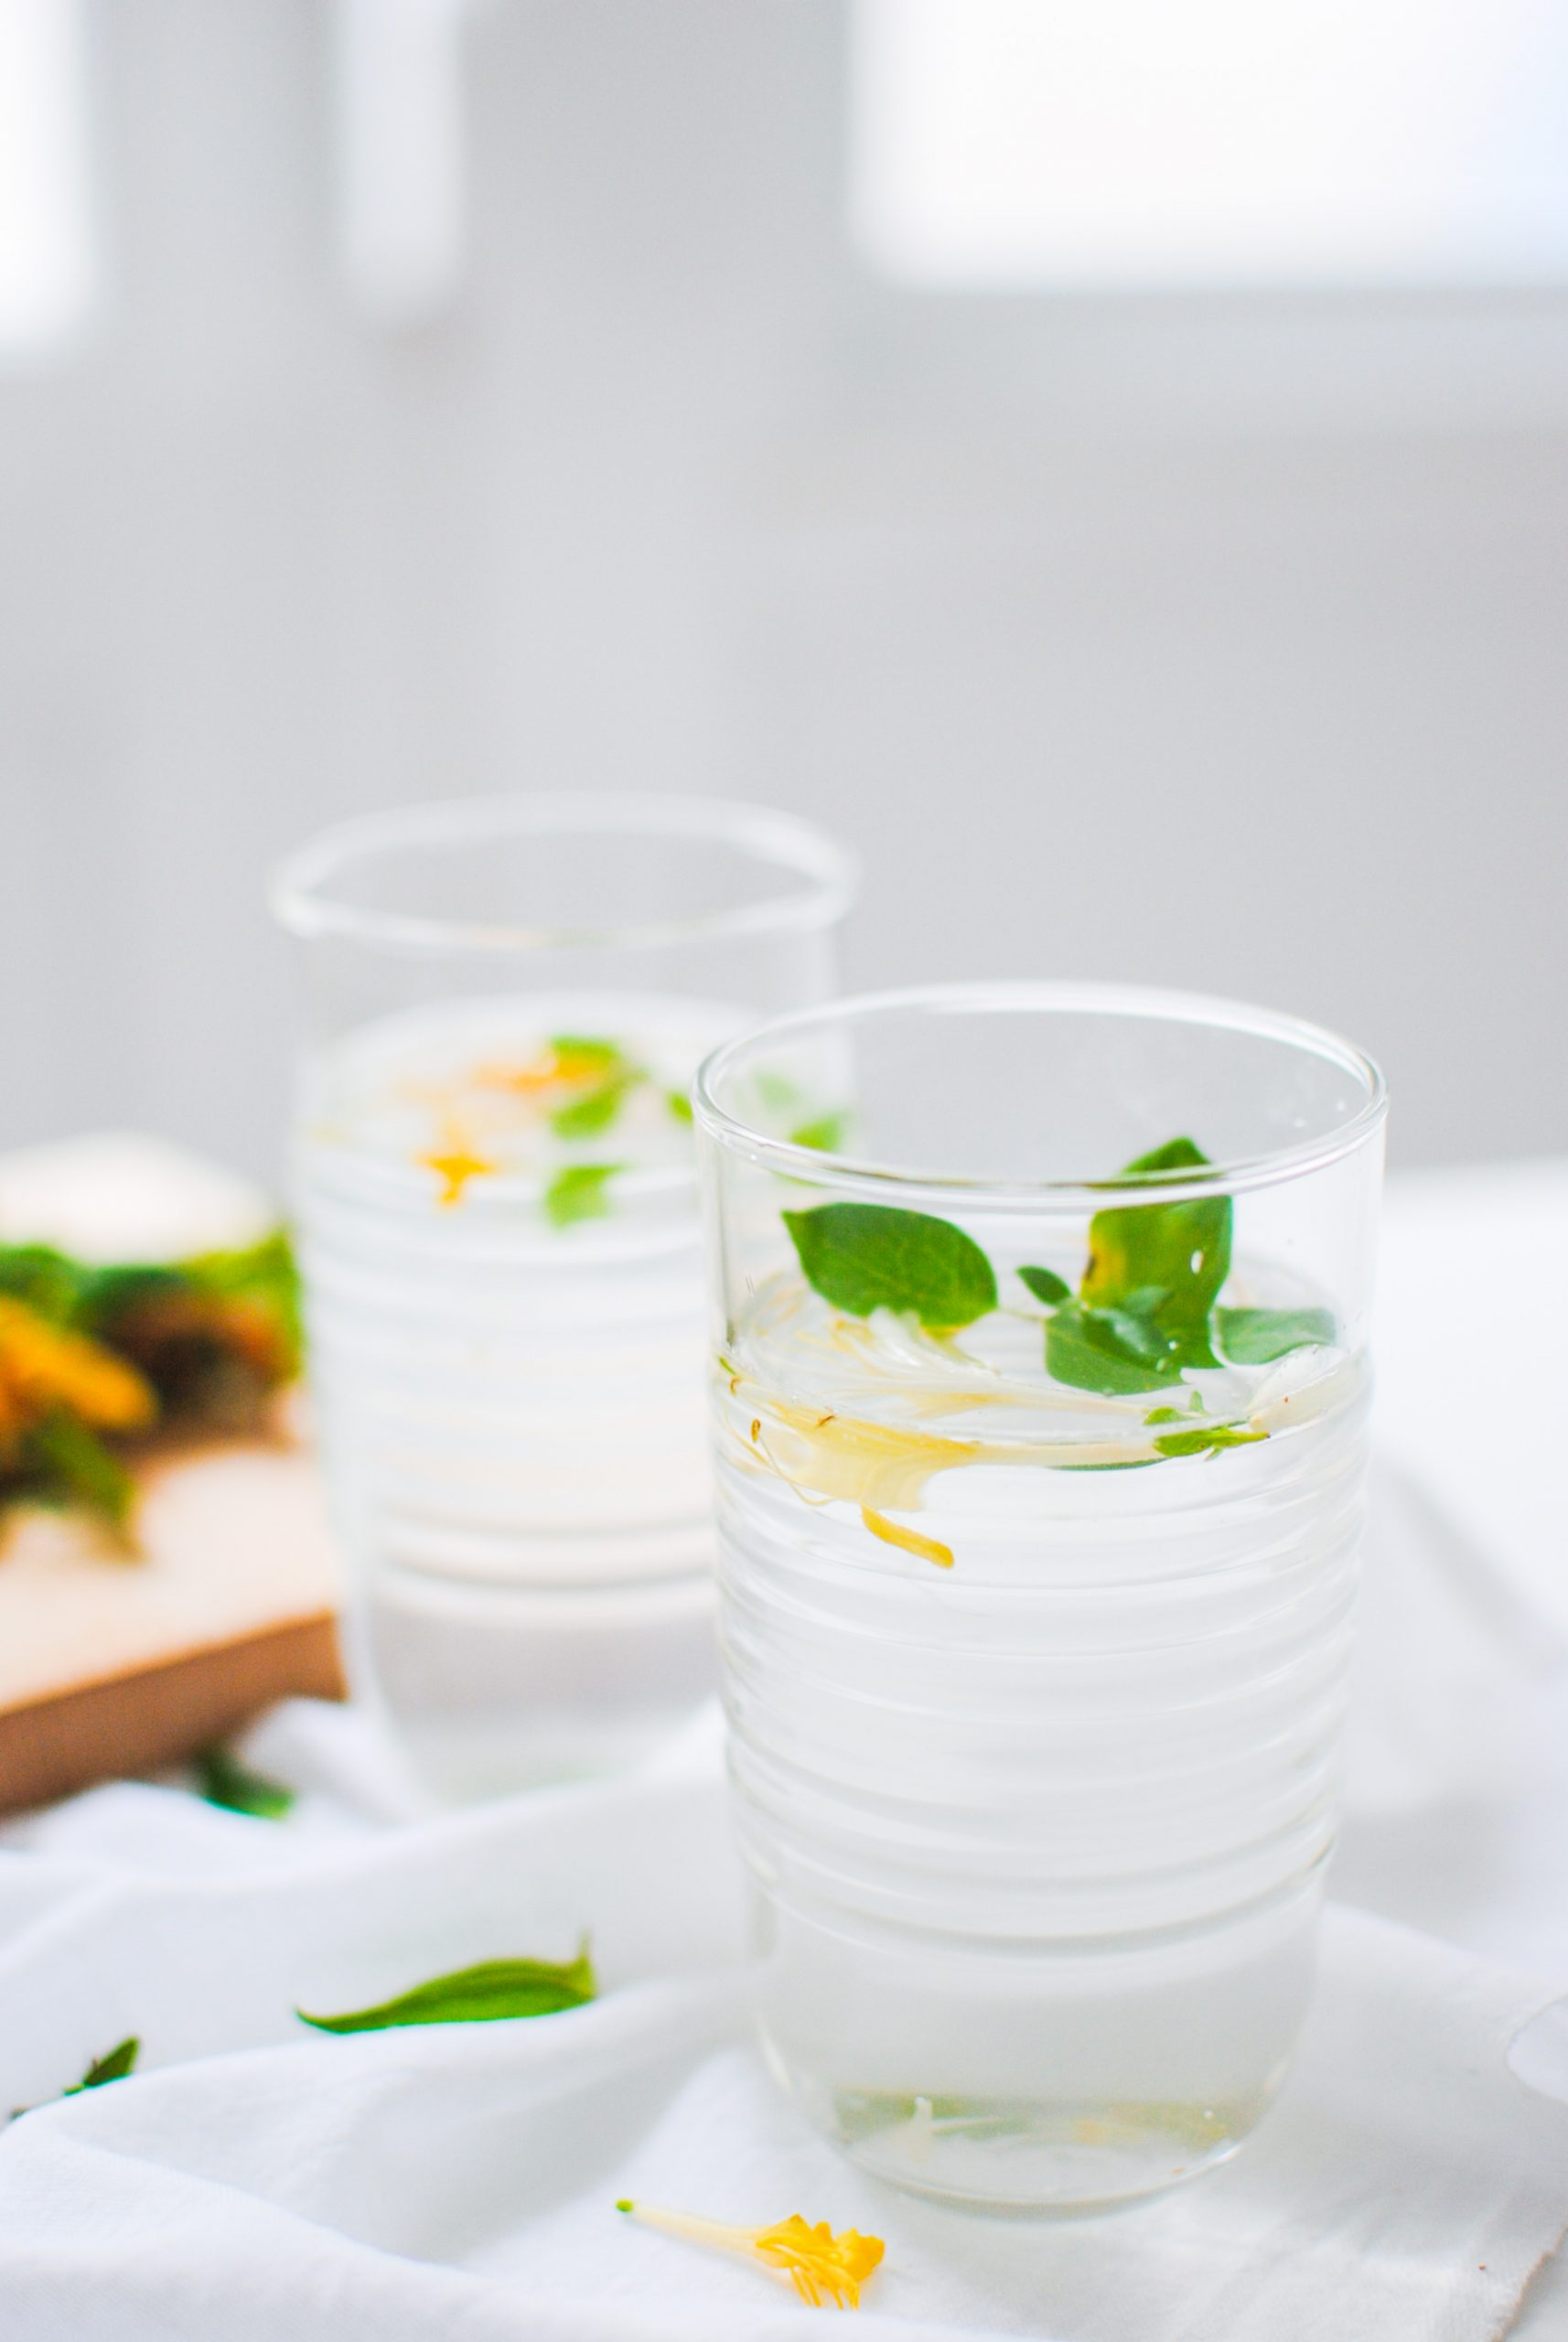 honeysuckle summer drink | please consider | joana limao